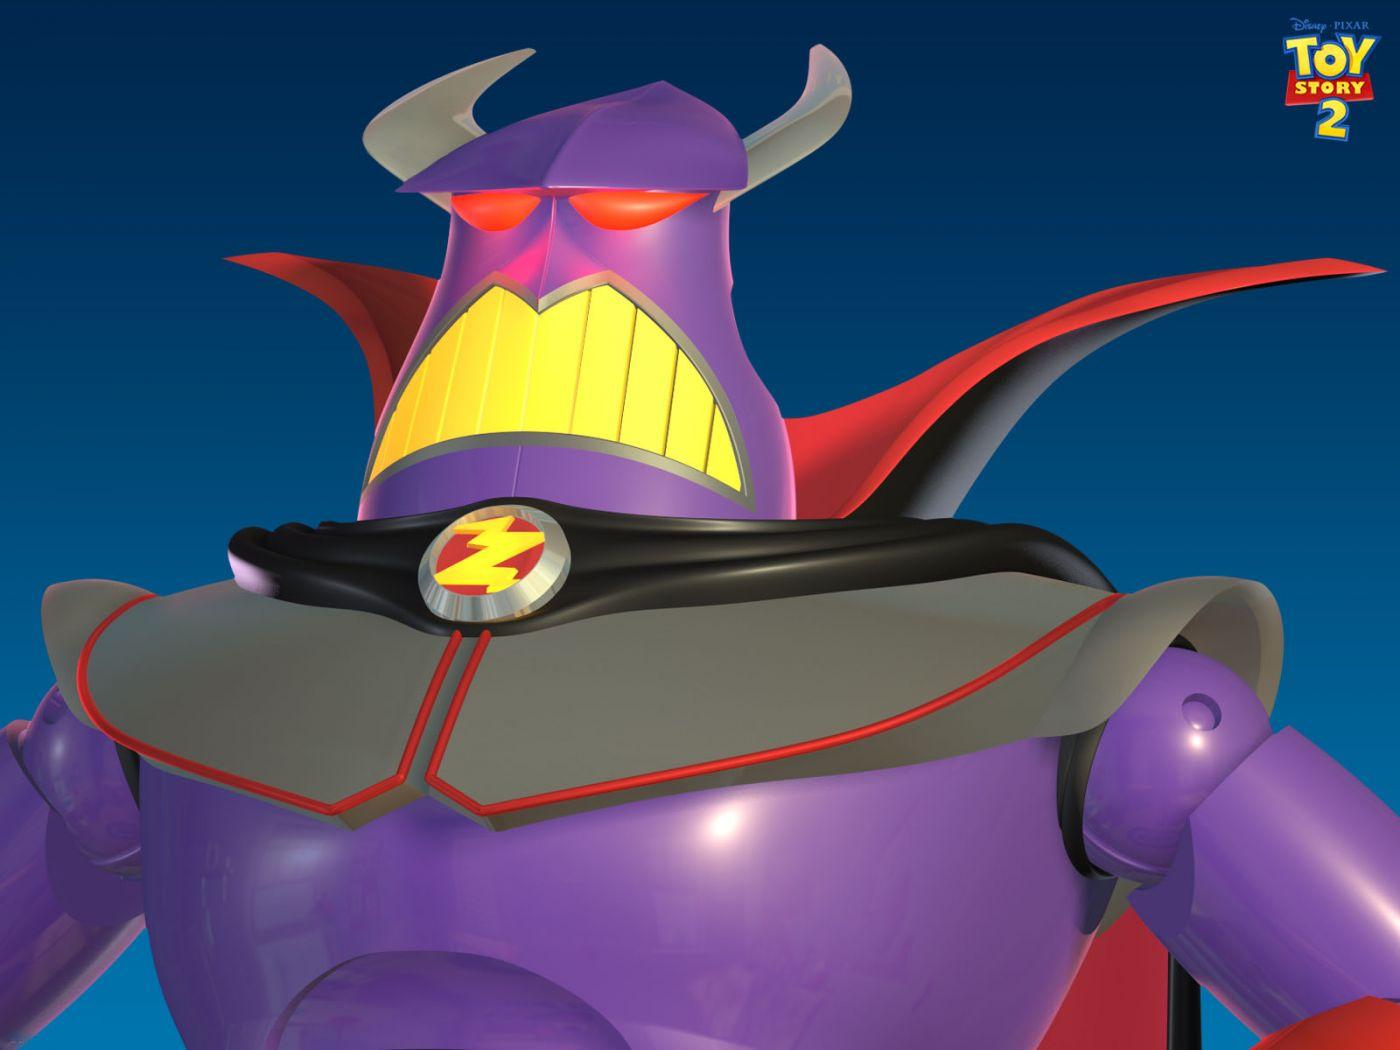 Zurg Headshot Toy Story 2 Wallpaper 1400x1050